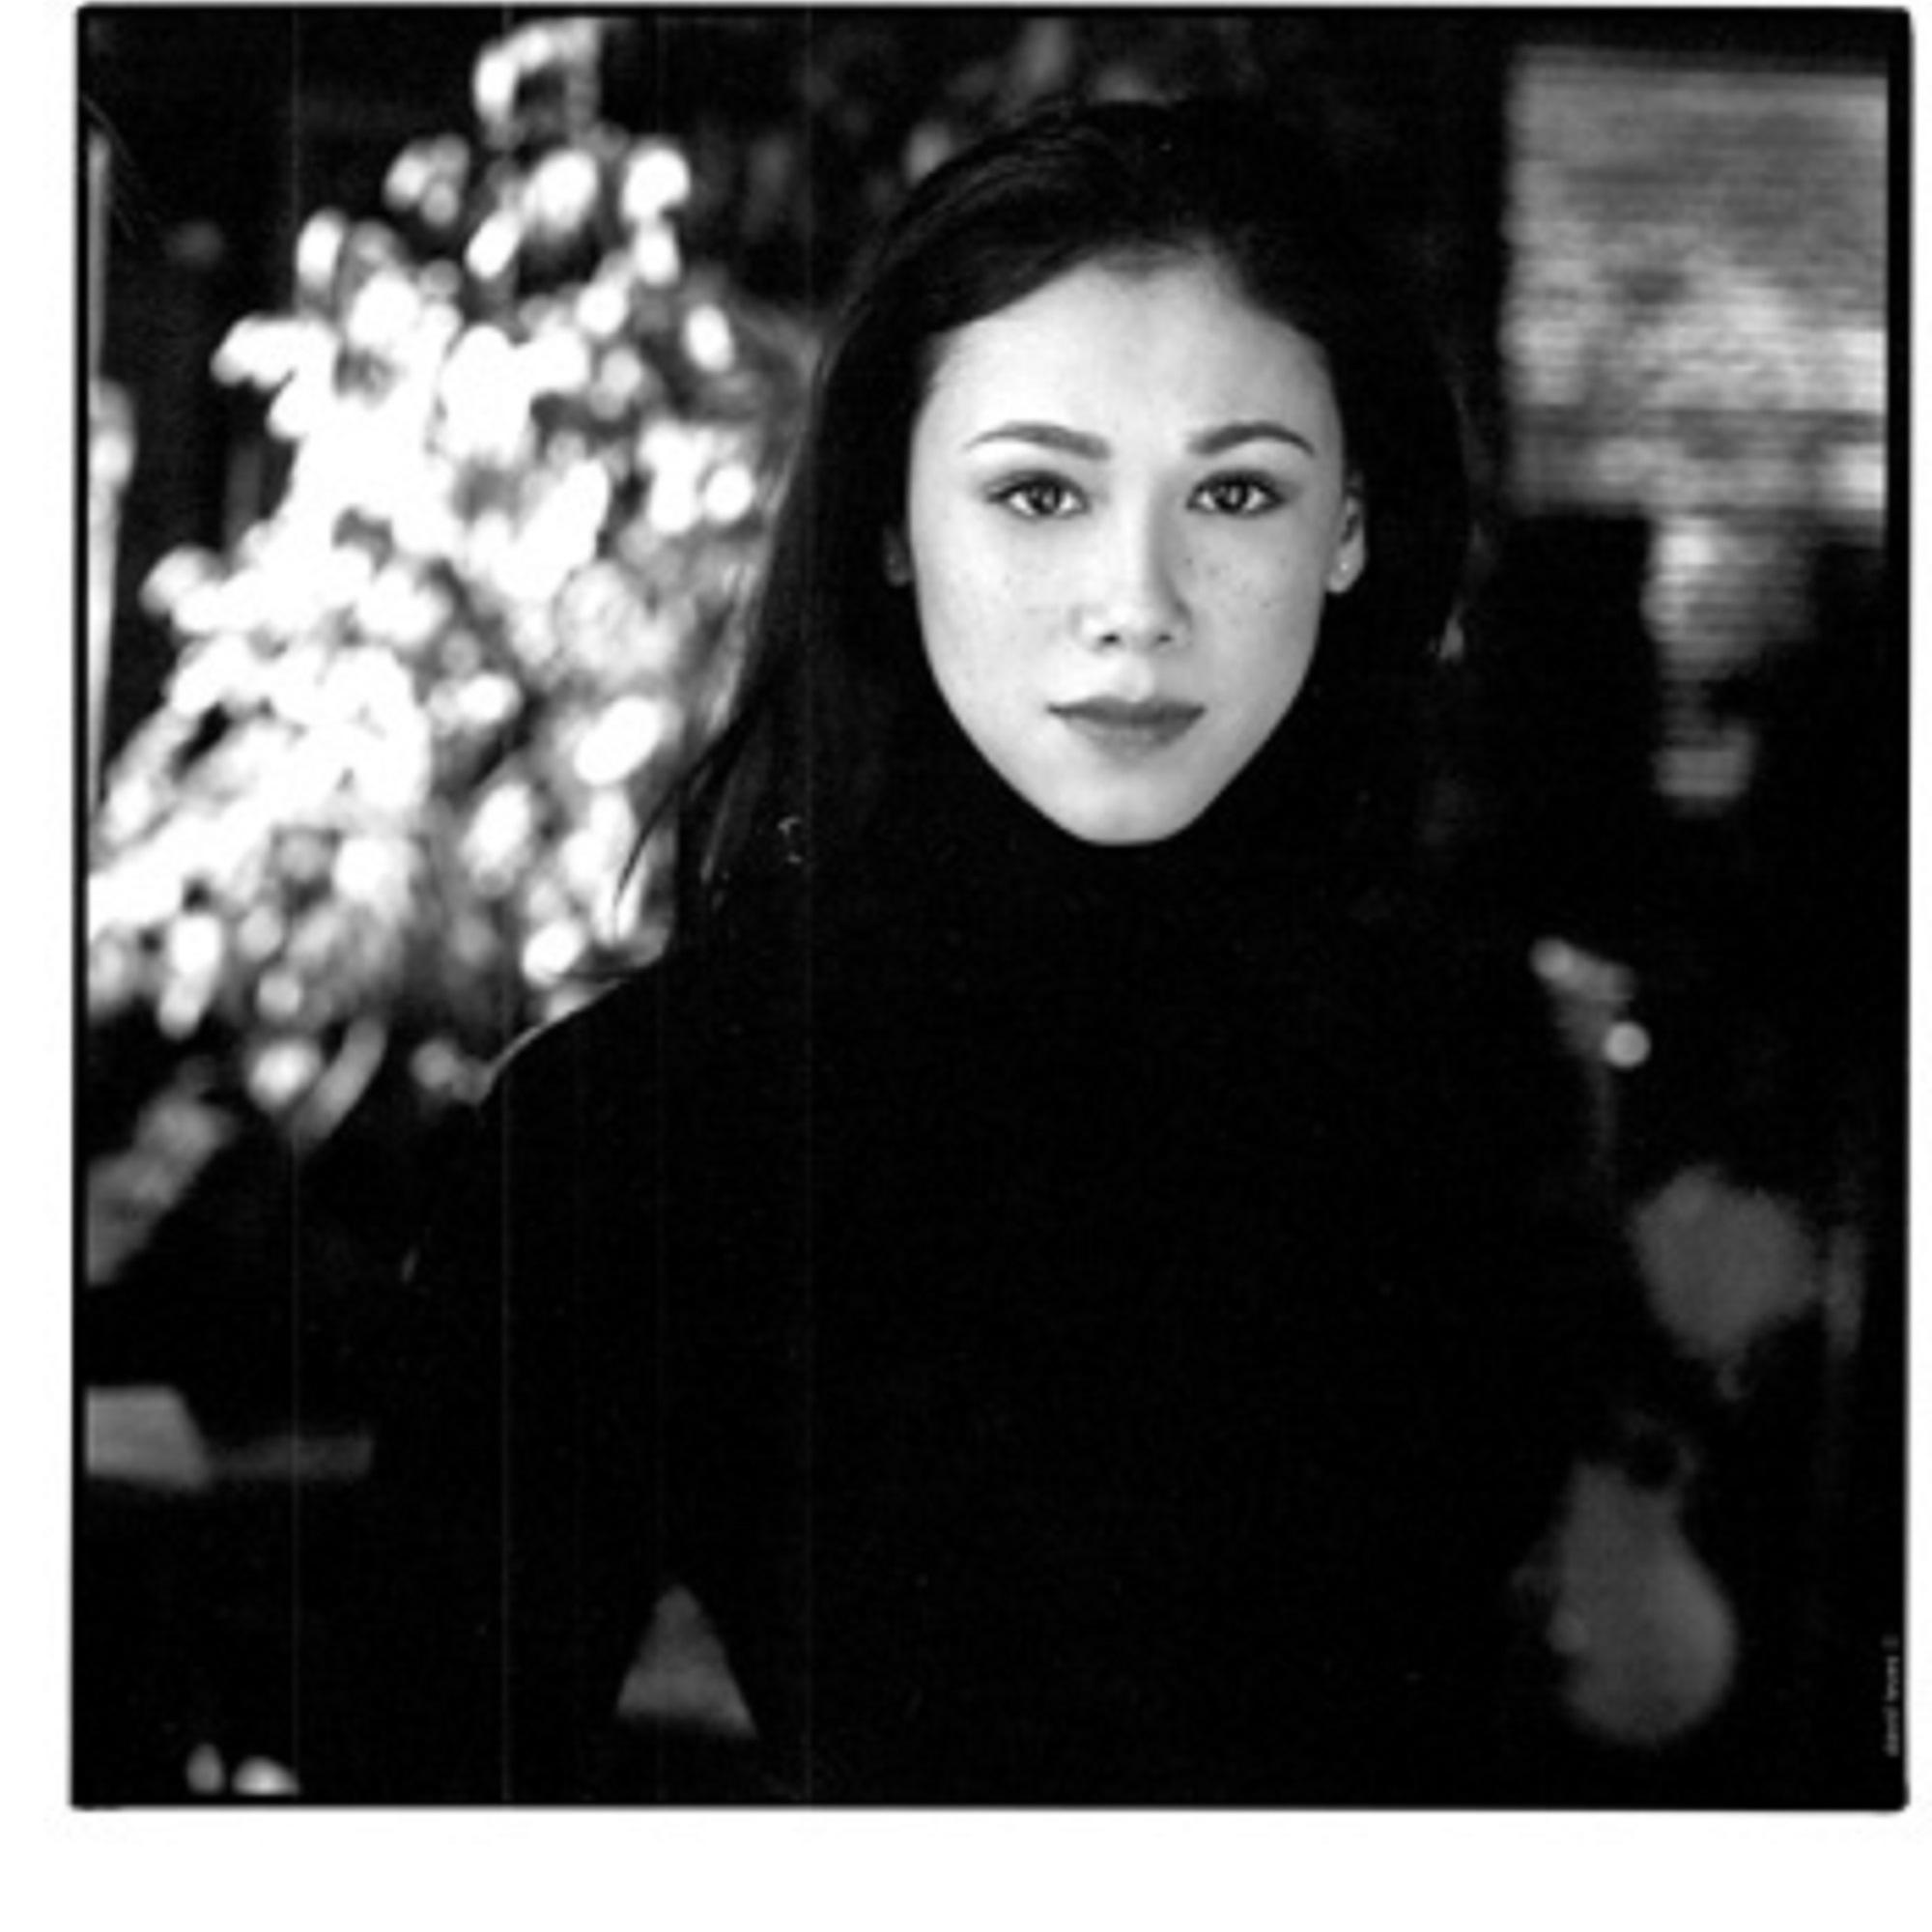 NICOLA PANTIN -CHOREOGRAPHER